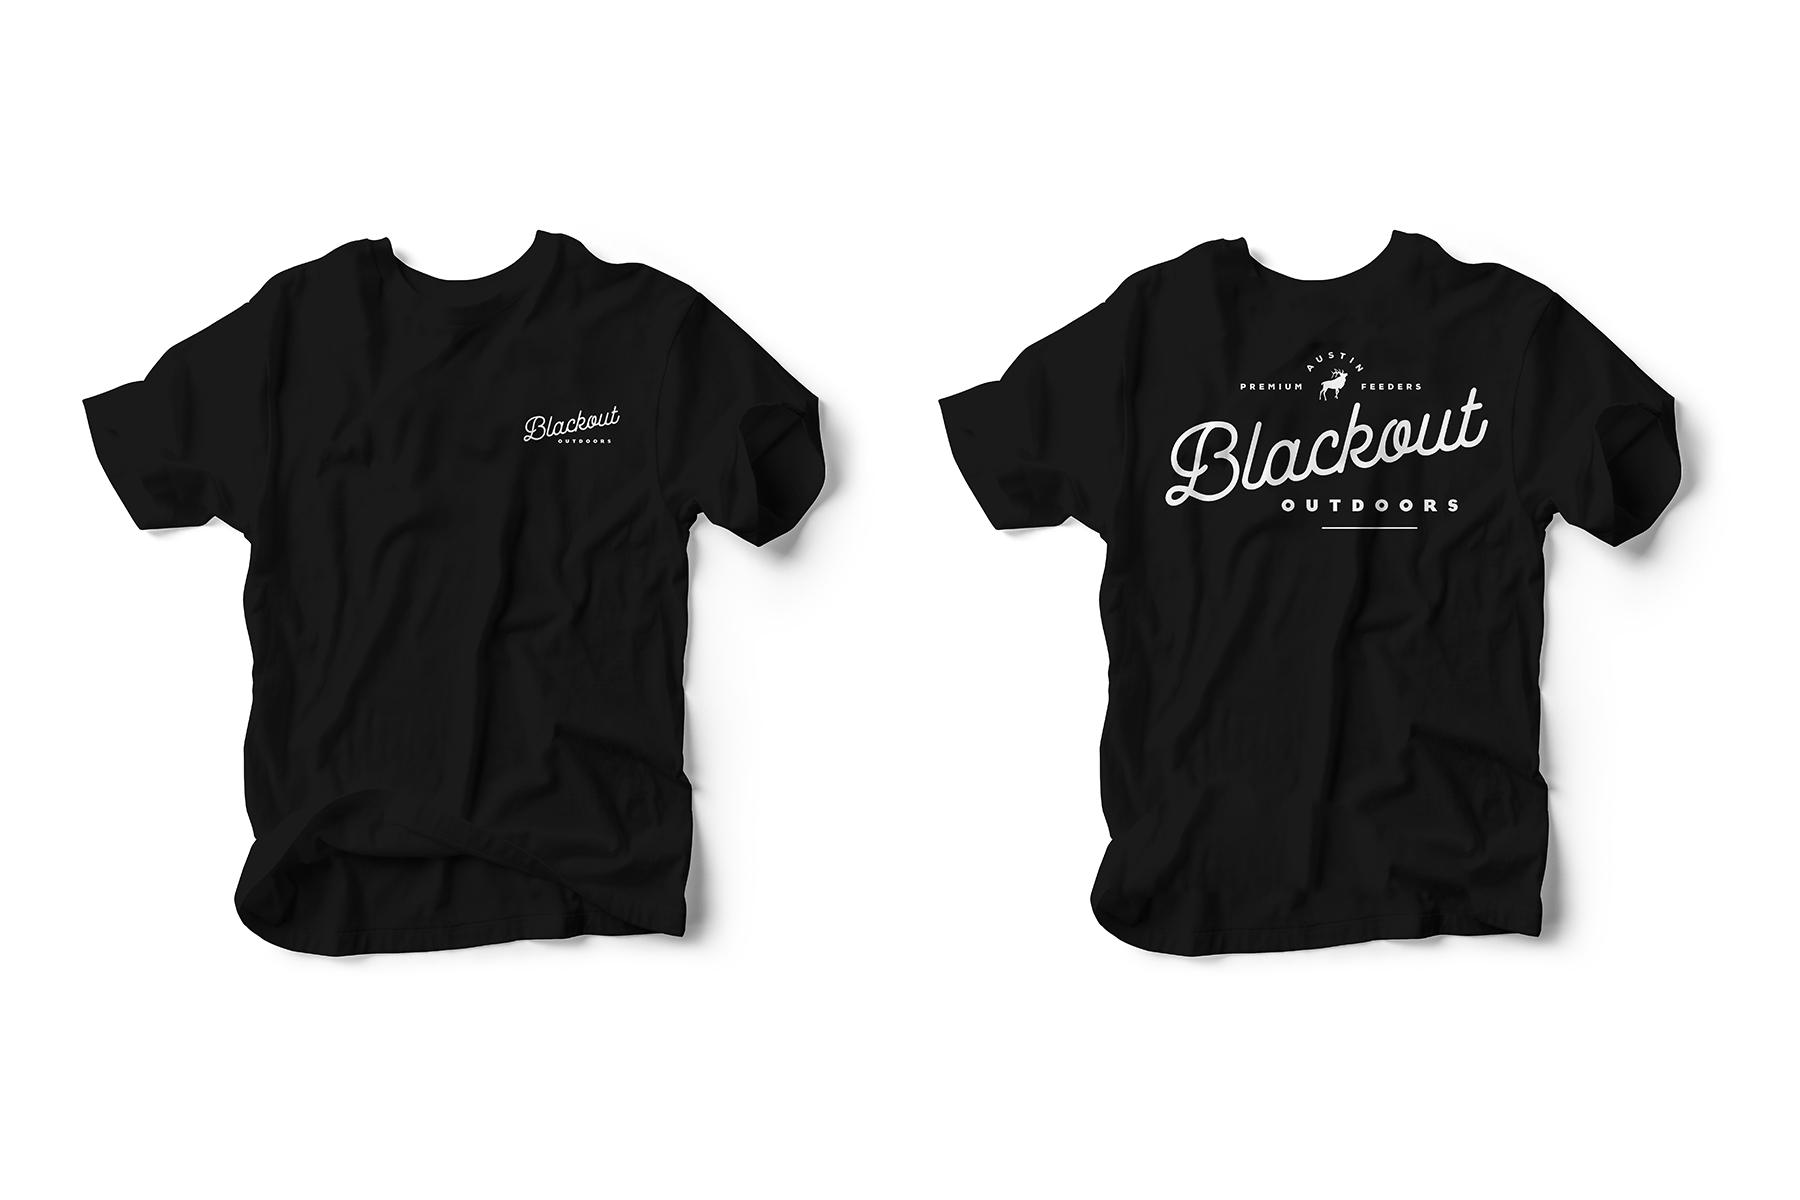 flaco_blackout_13.jpg